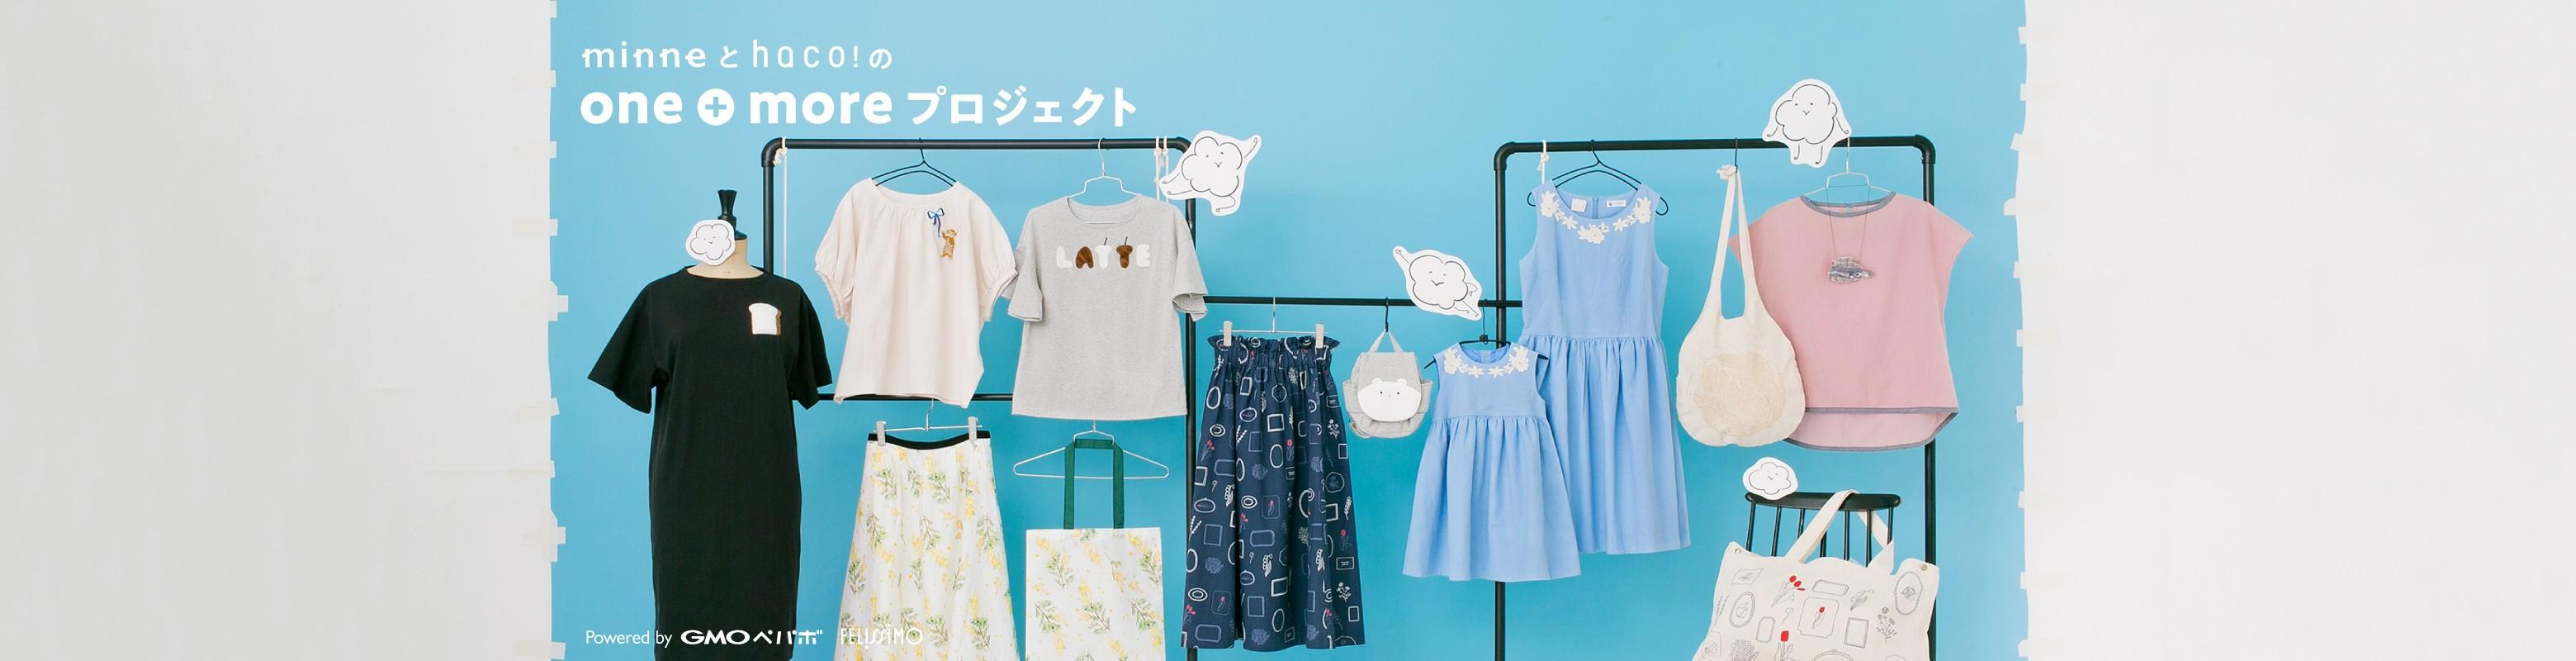 minneとhaco!のone+moreプロジェクト